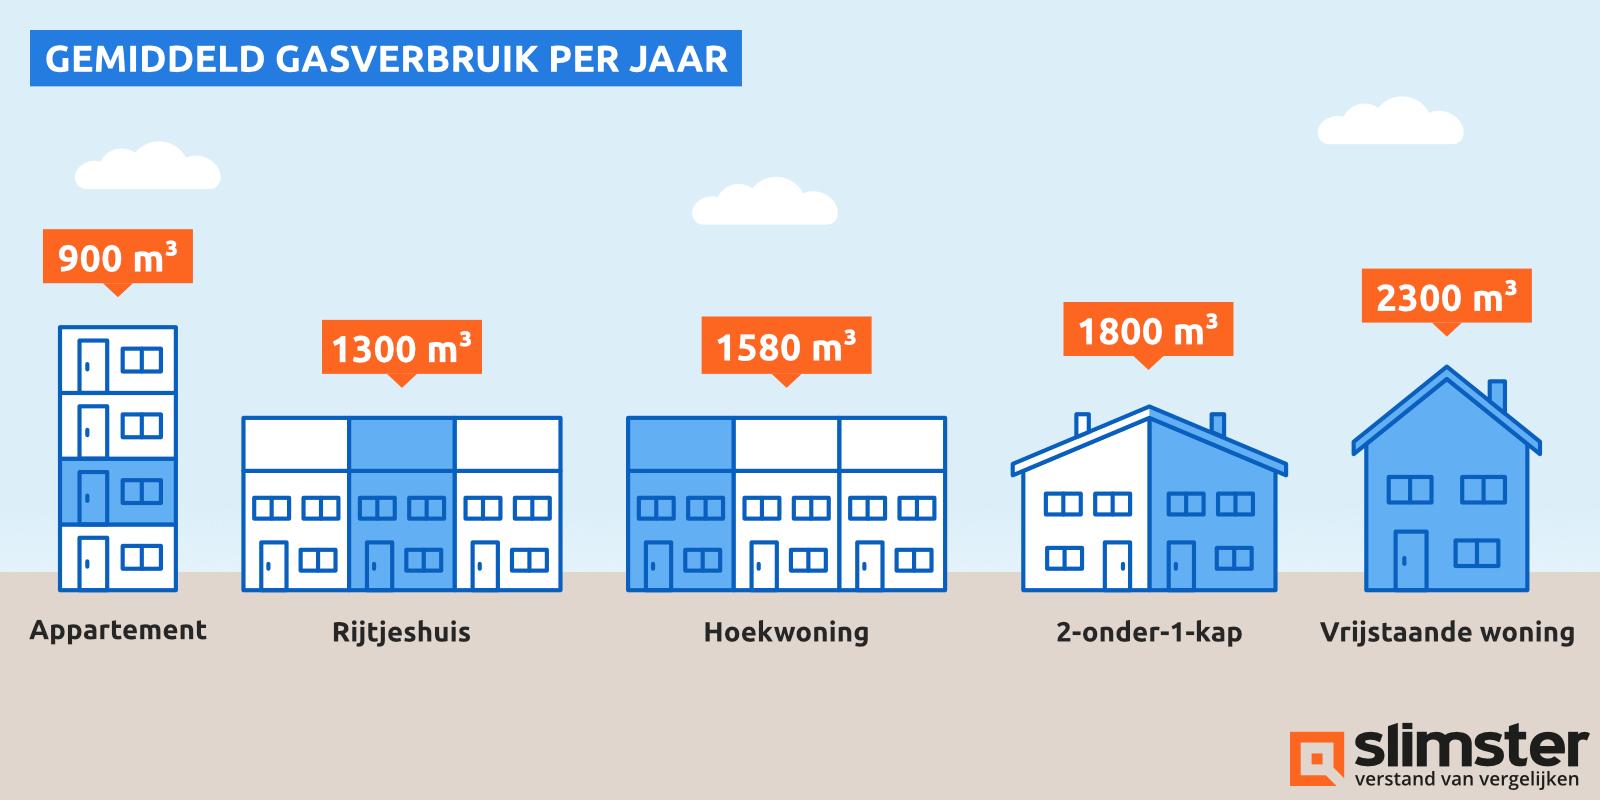 gemiddeld gasverbruik per jaar